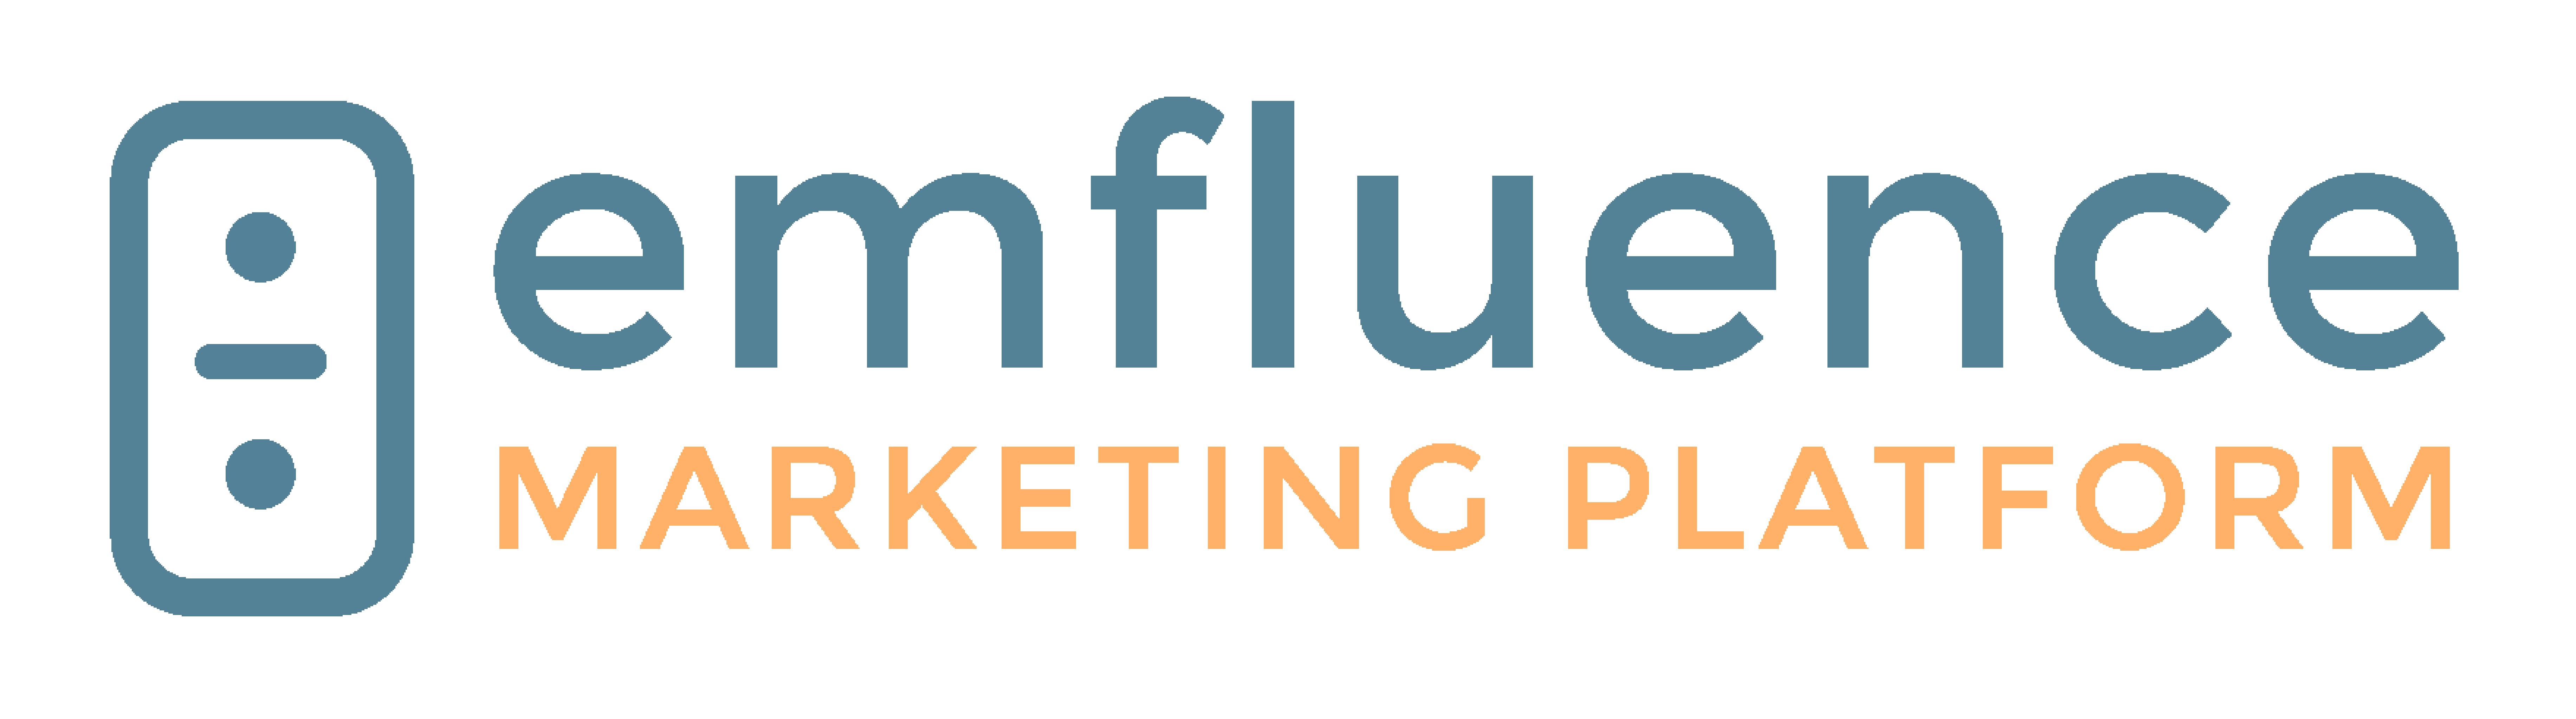 emfluence Marketing Platform